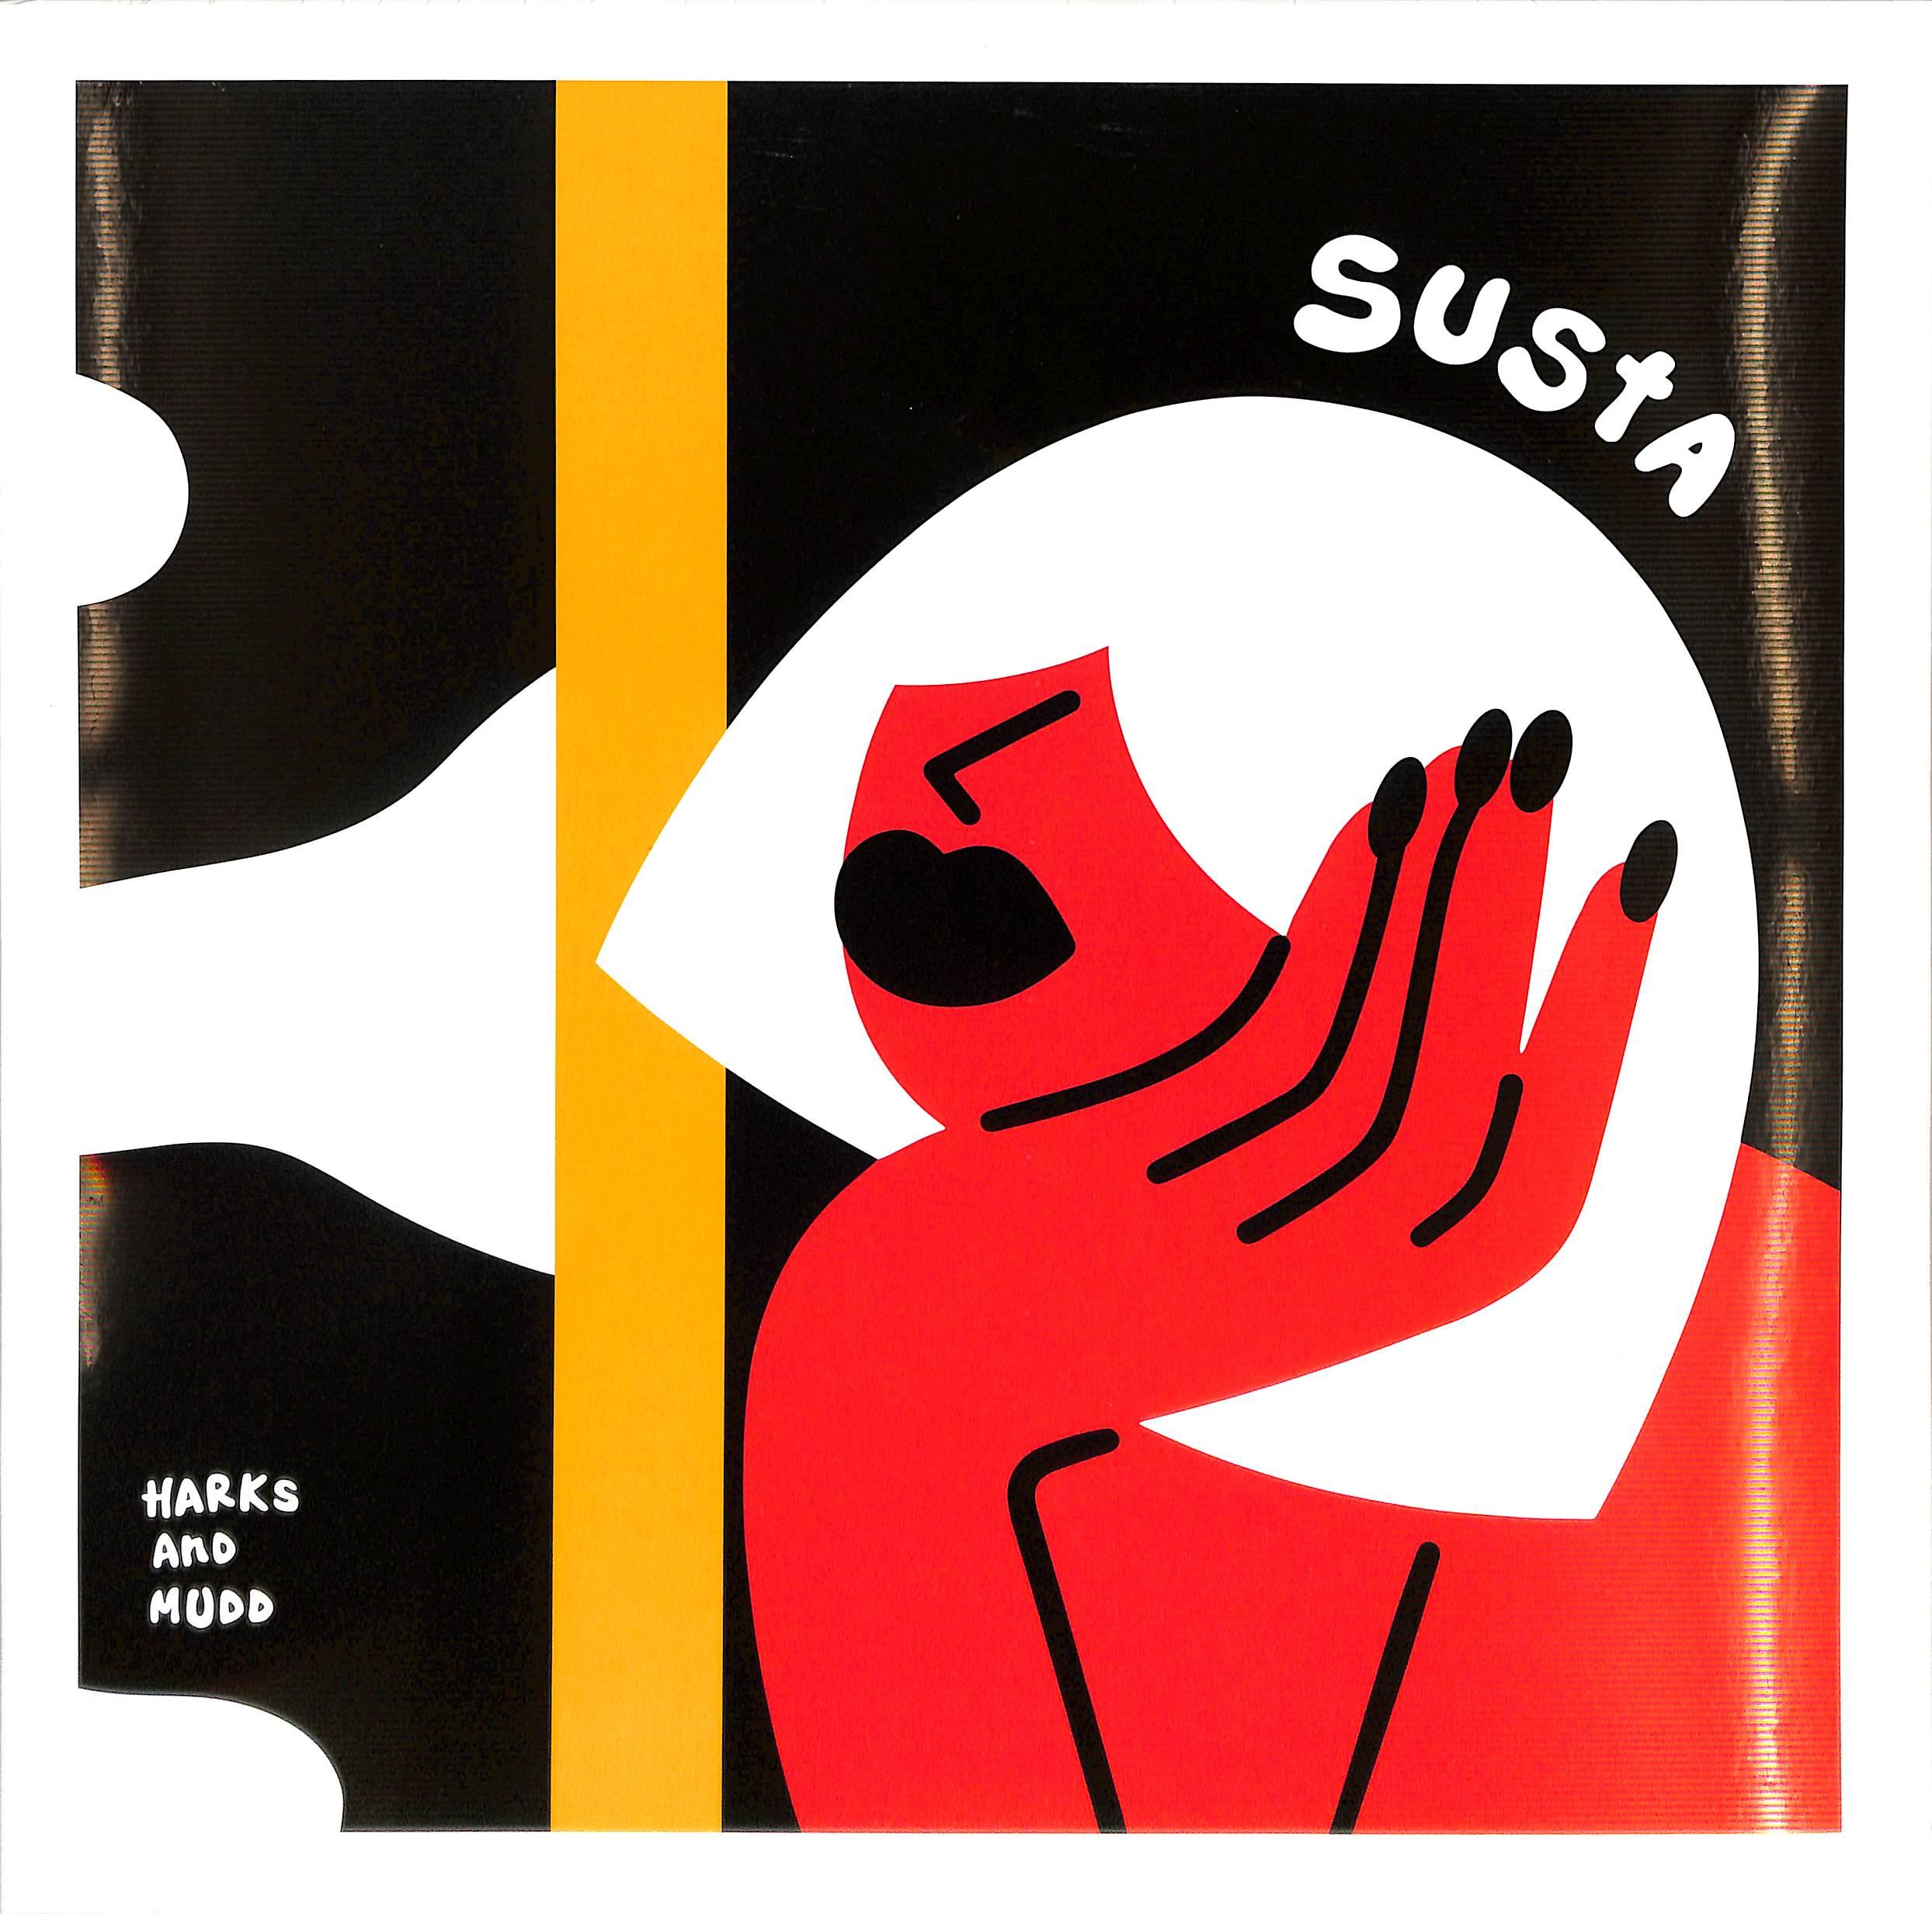 Harks & Mudd - SUSTA